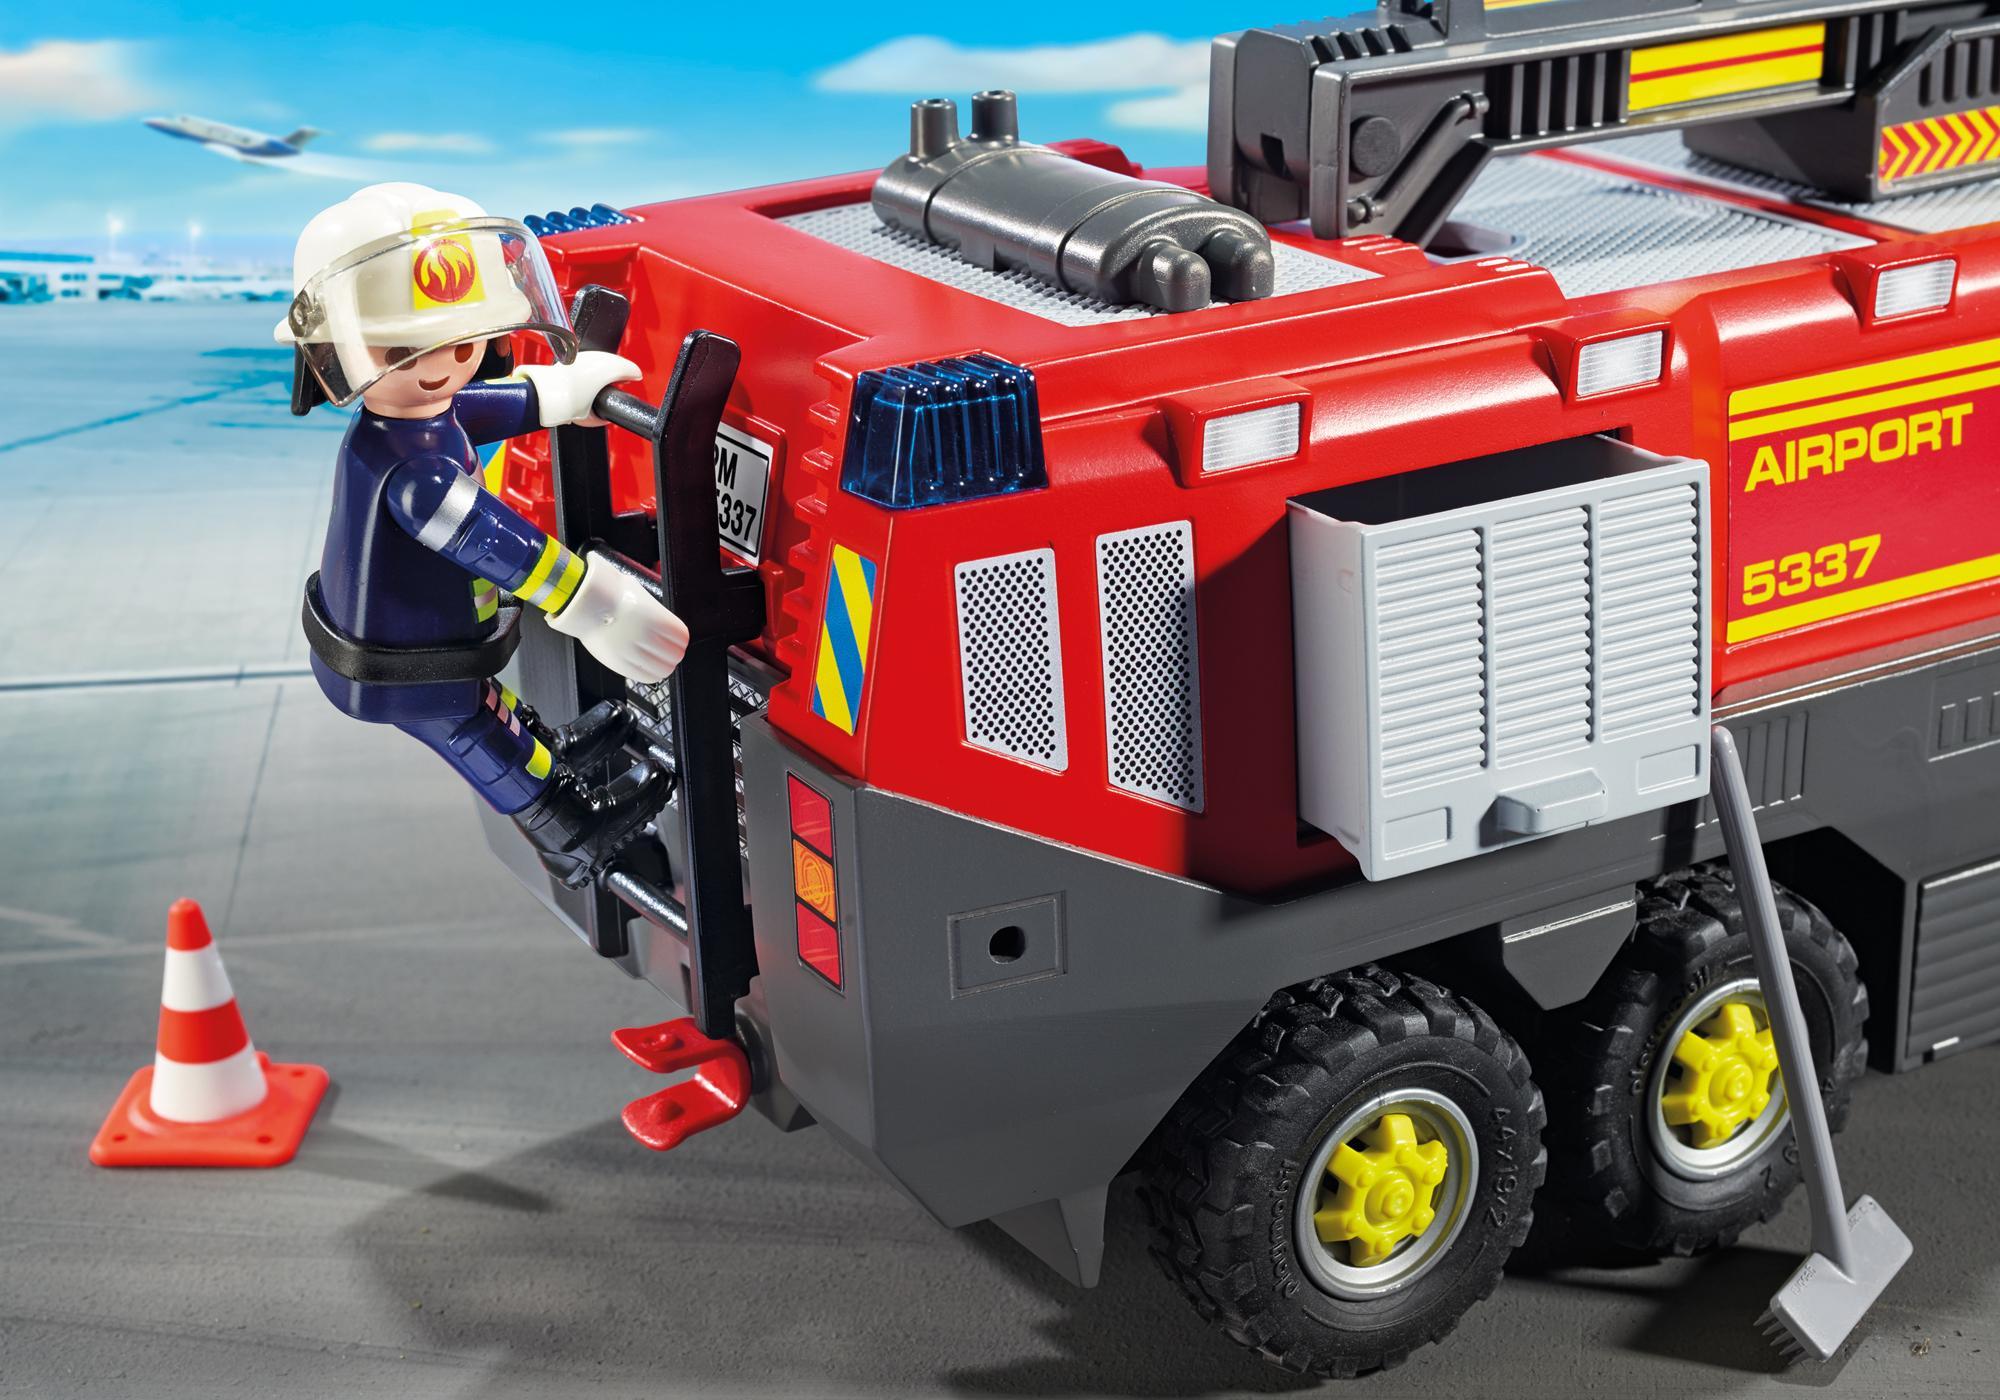 http://media.playmobil.com/i/playmobil/5337_product_extra2/Πυροσβεστικό όχημα αεροδρομίου με φώτα και ήχο